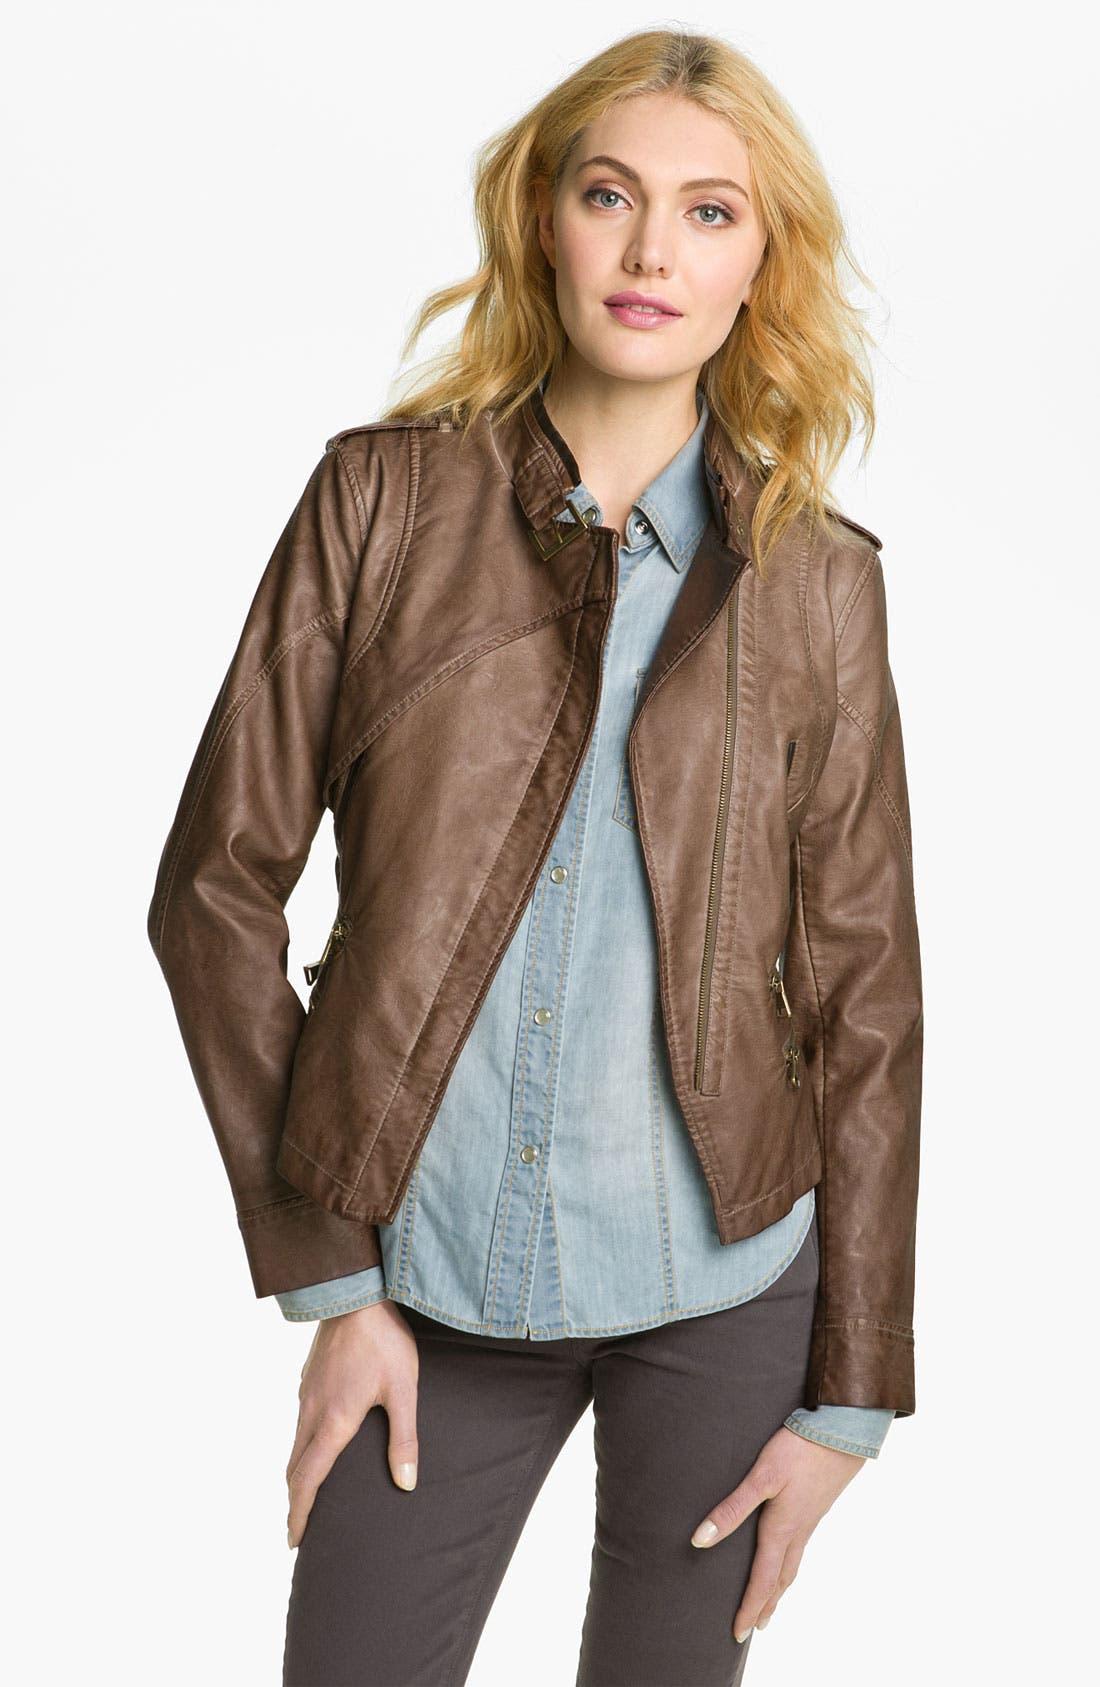 Alternate Image 1 Selected - Steve Madden Asymmetrical Faux Leather Jacket